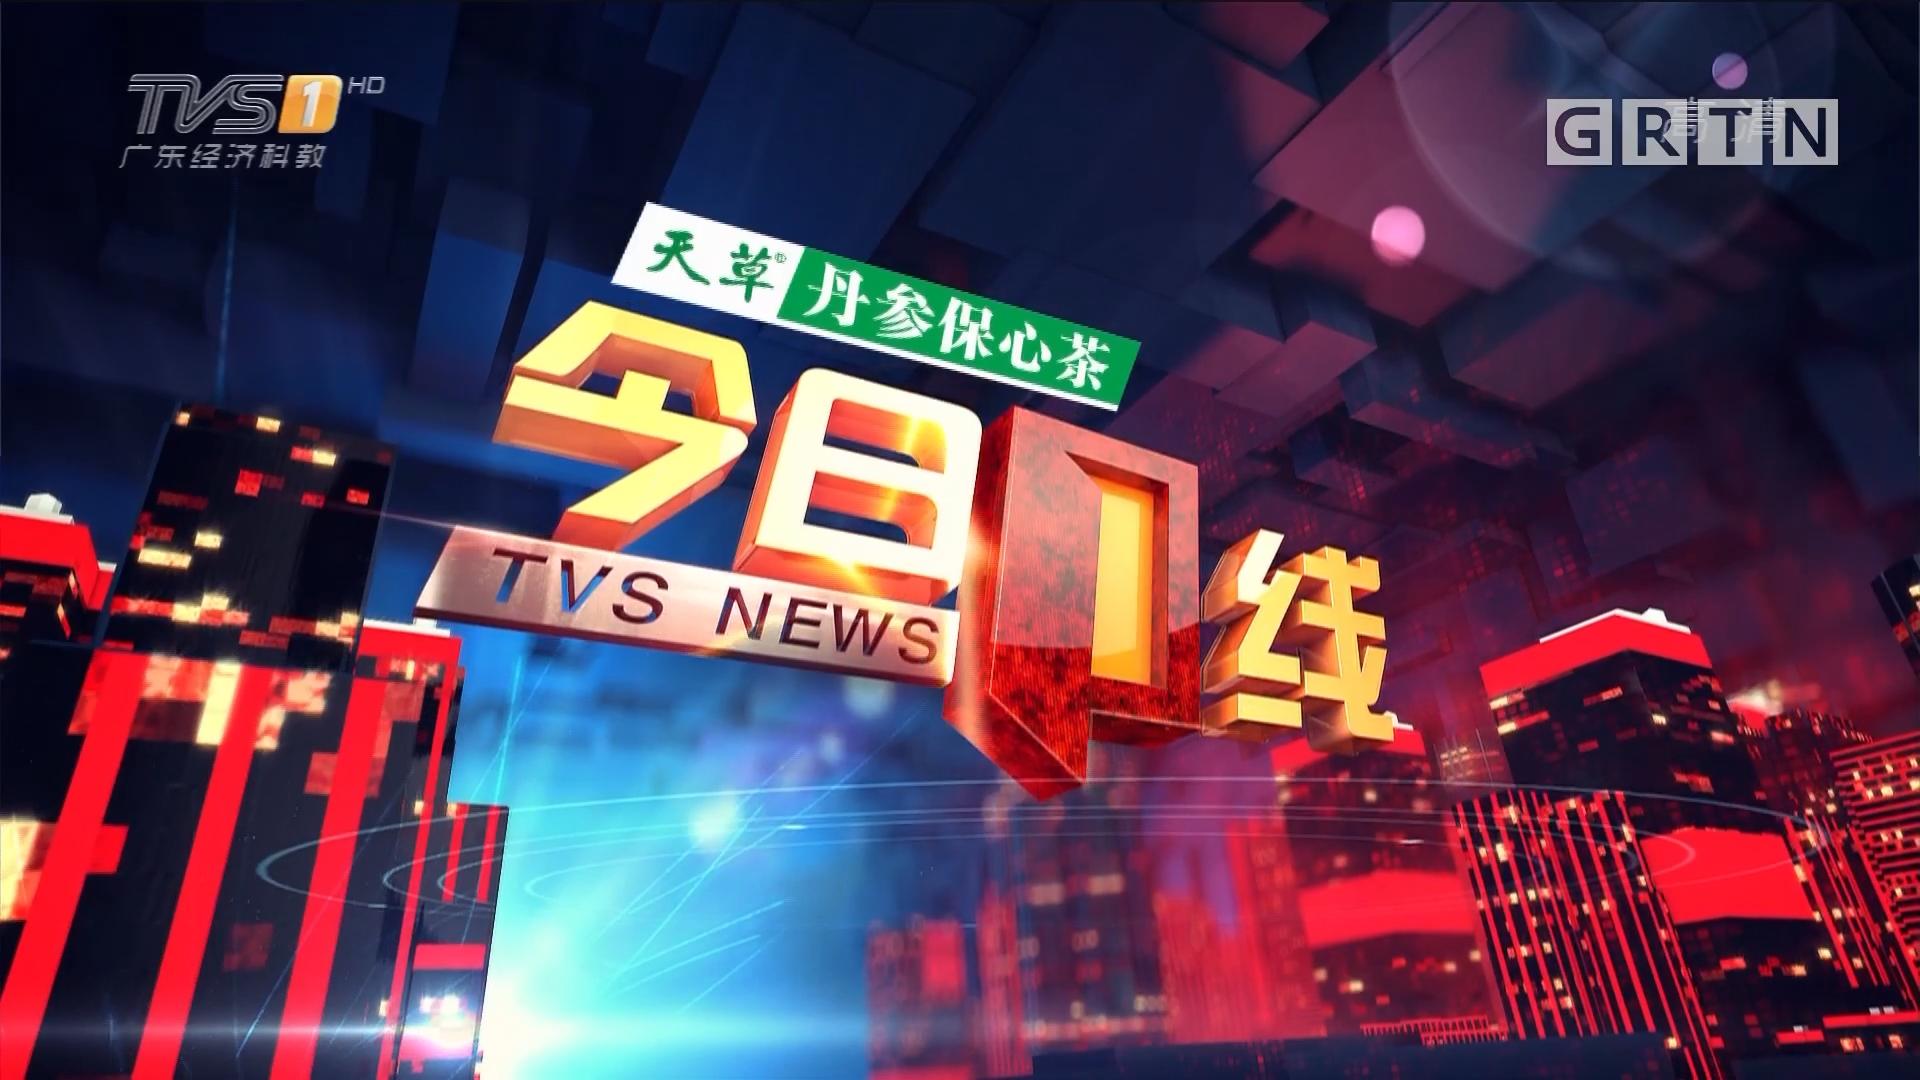 [HD][2017-11-26]今日一线:深圳宝安:4岁娃被卡16公分墙缝 消防破墙救援